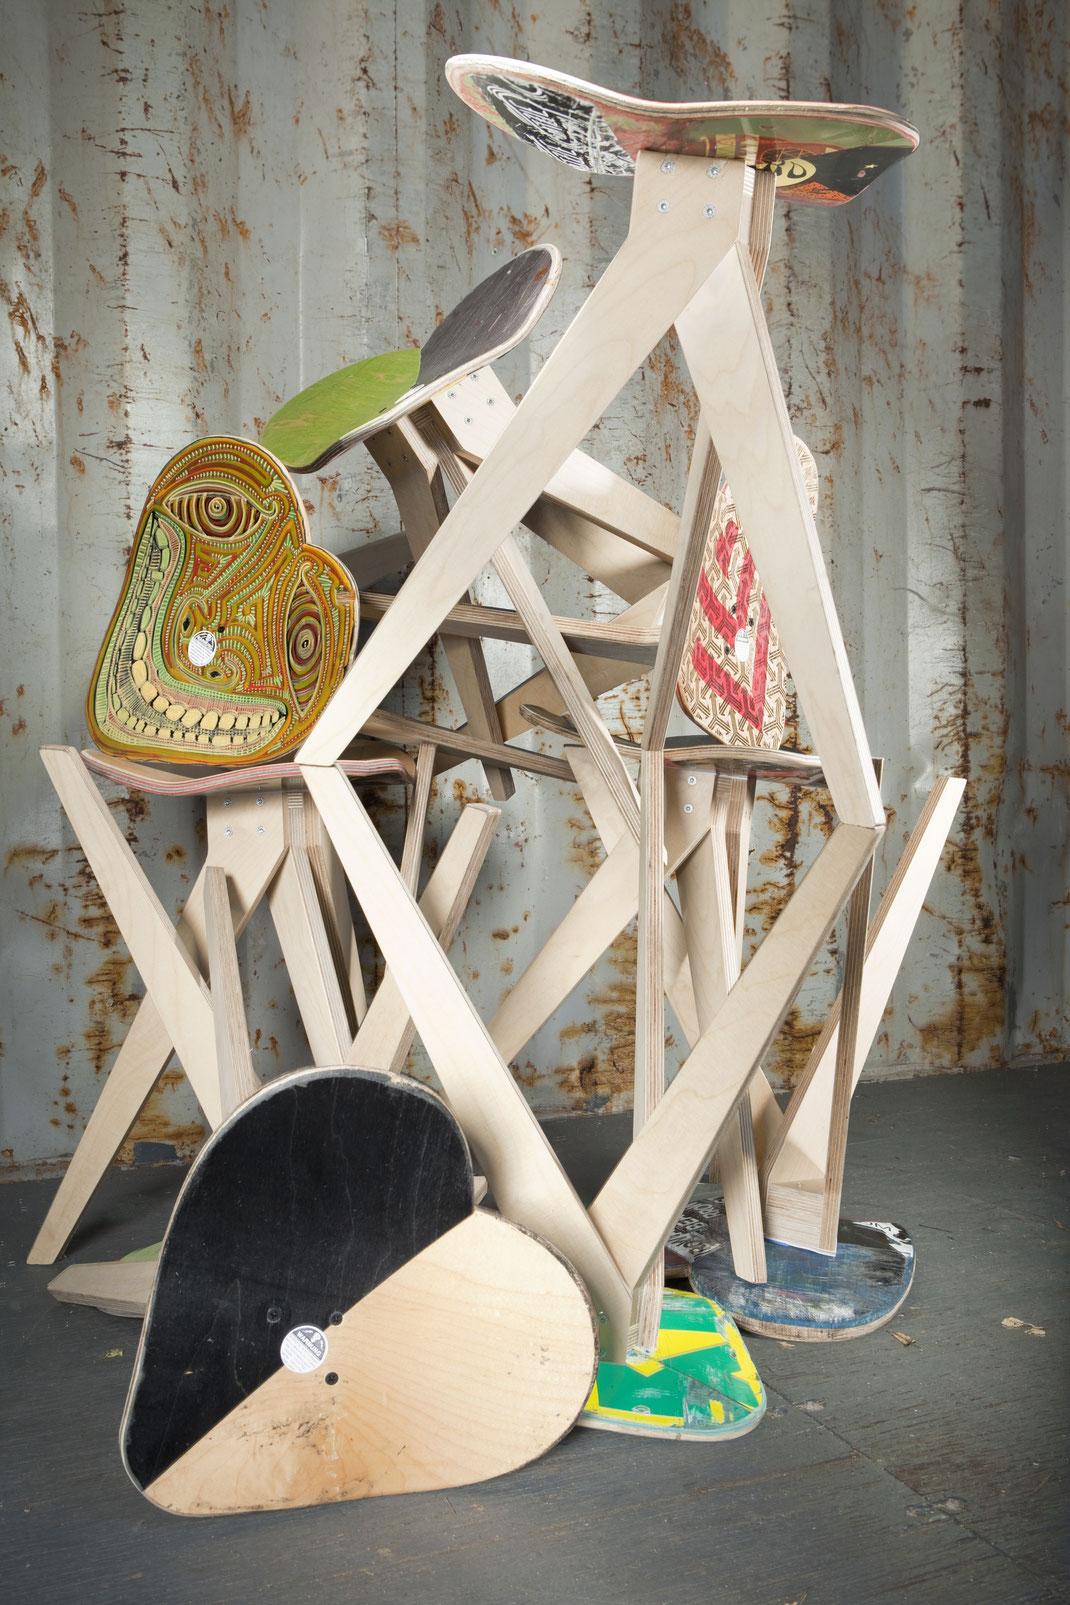 skateboard chair in a garage